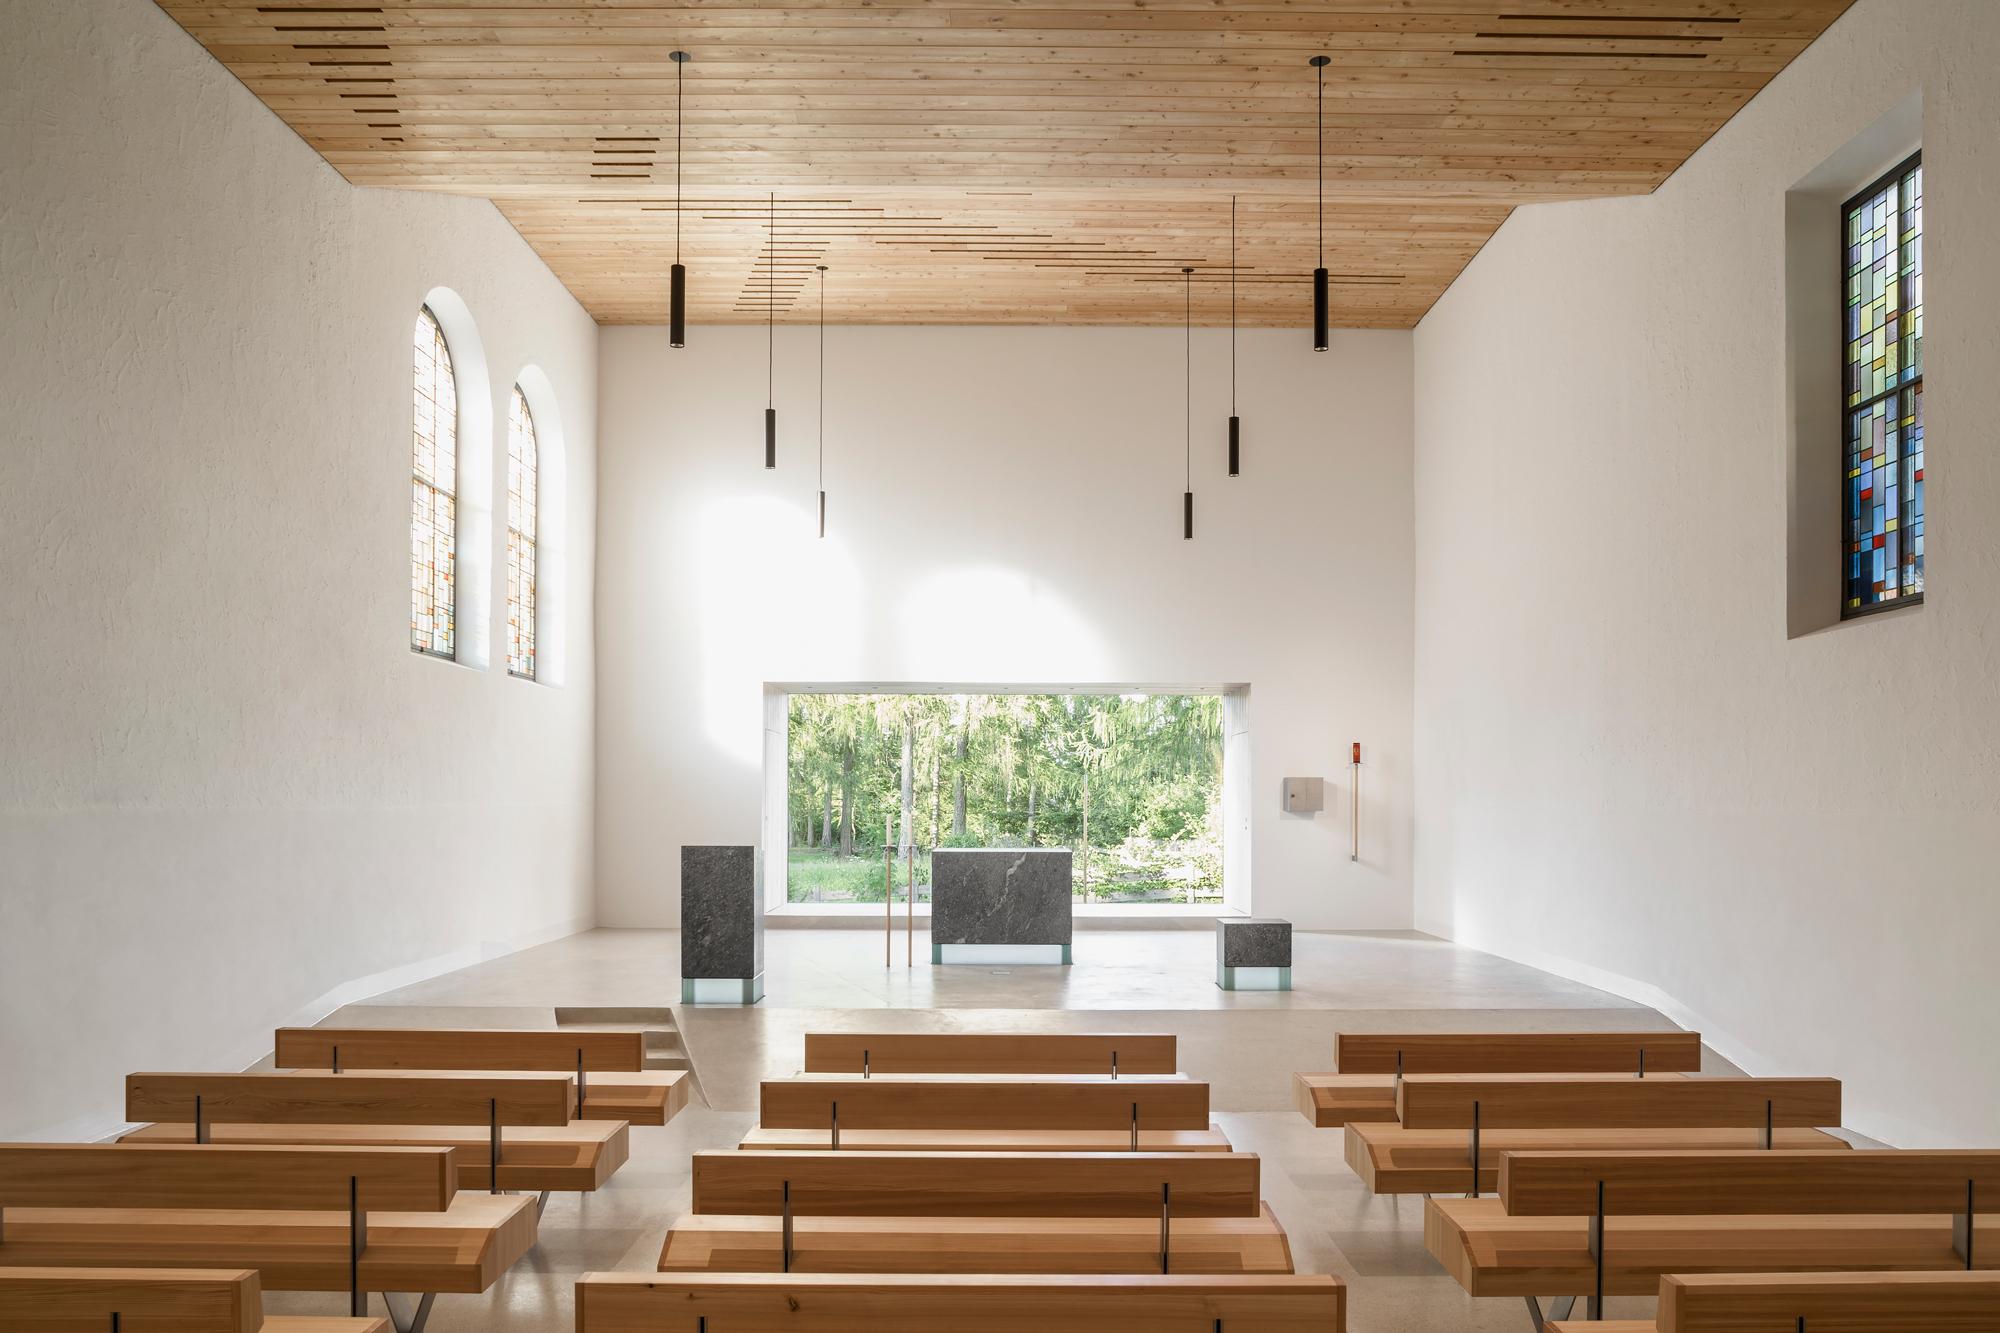 2017-09-20_59c2214bea83b_LST_03_view-onto-presbytery